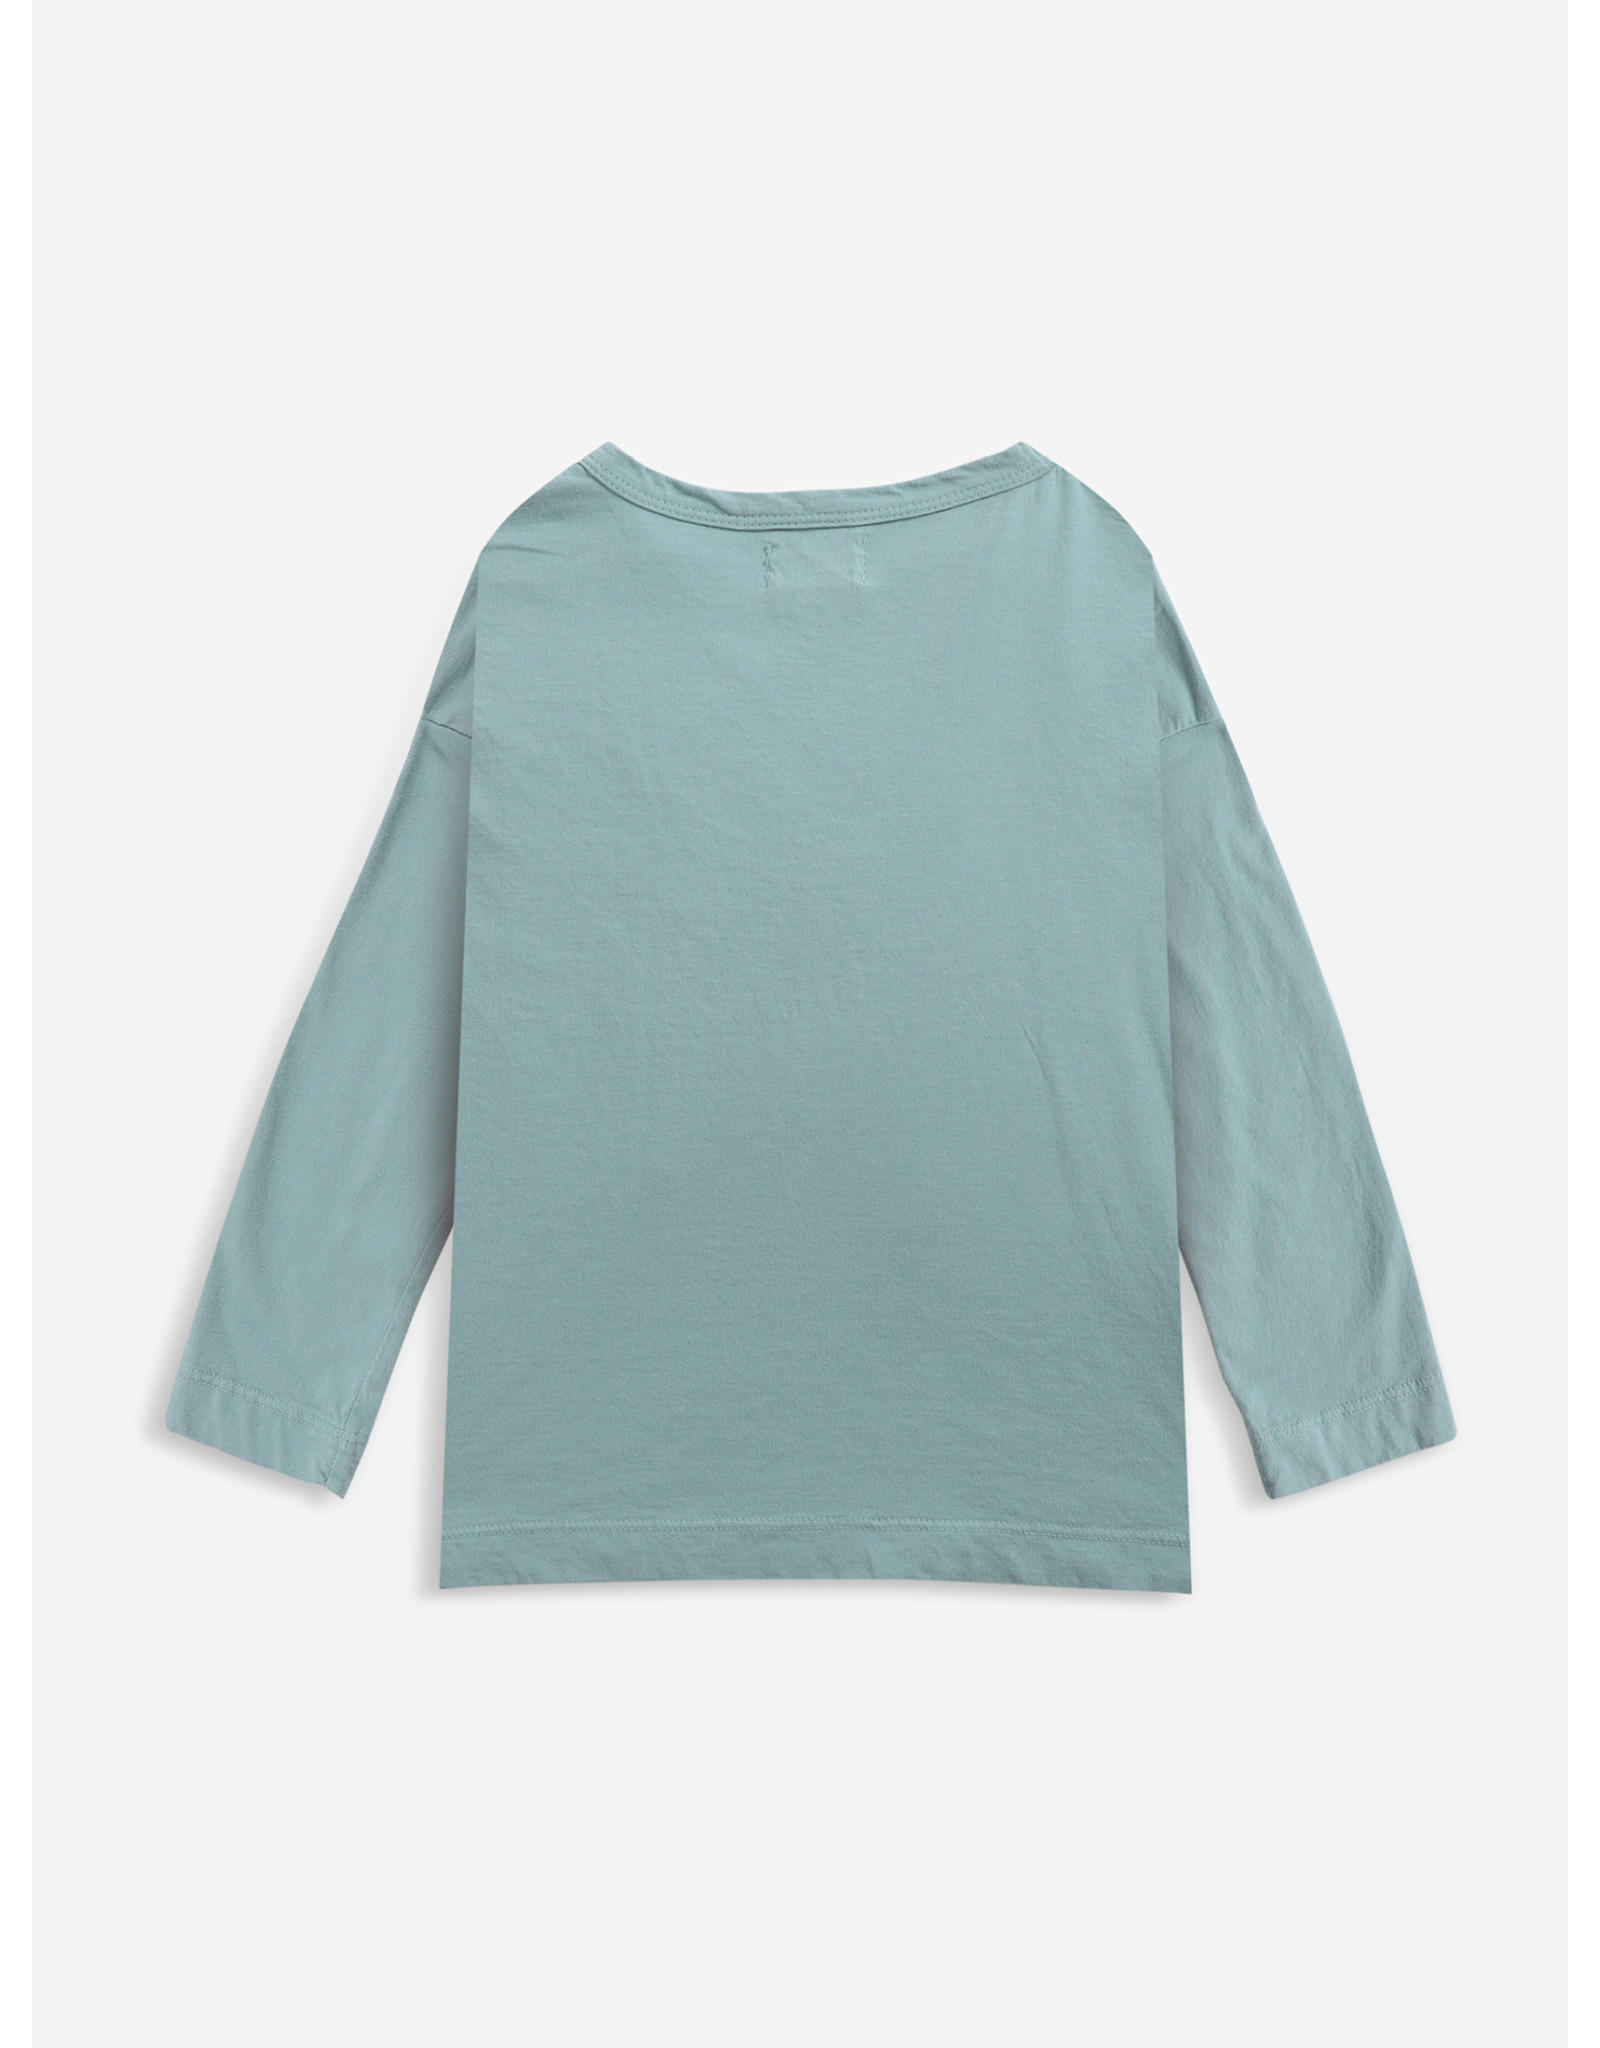 Bobo Choses Bobo Choses Birdie Long Sleeve T-Shirt